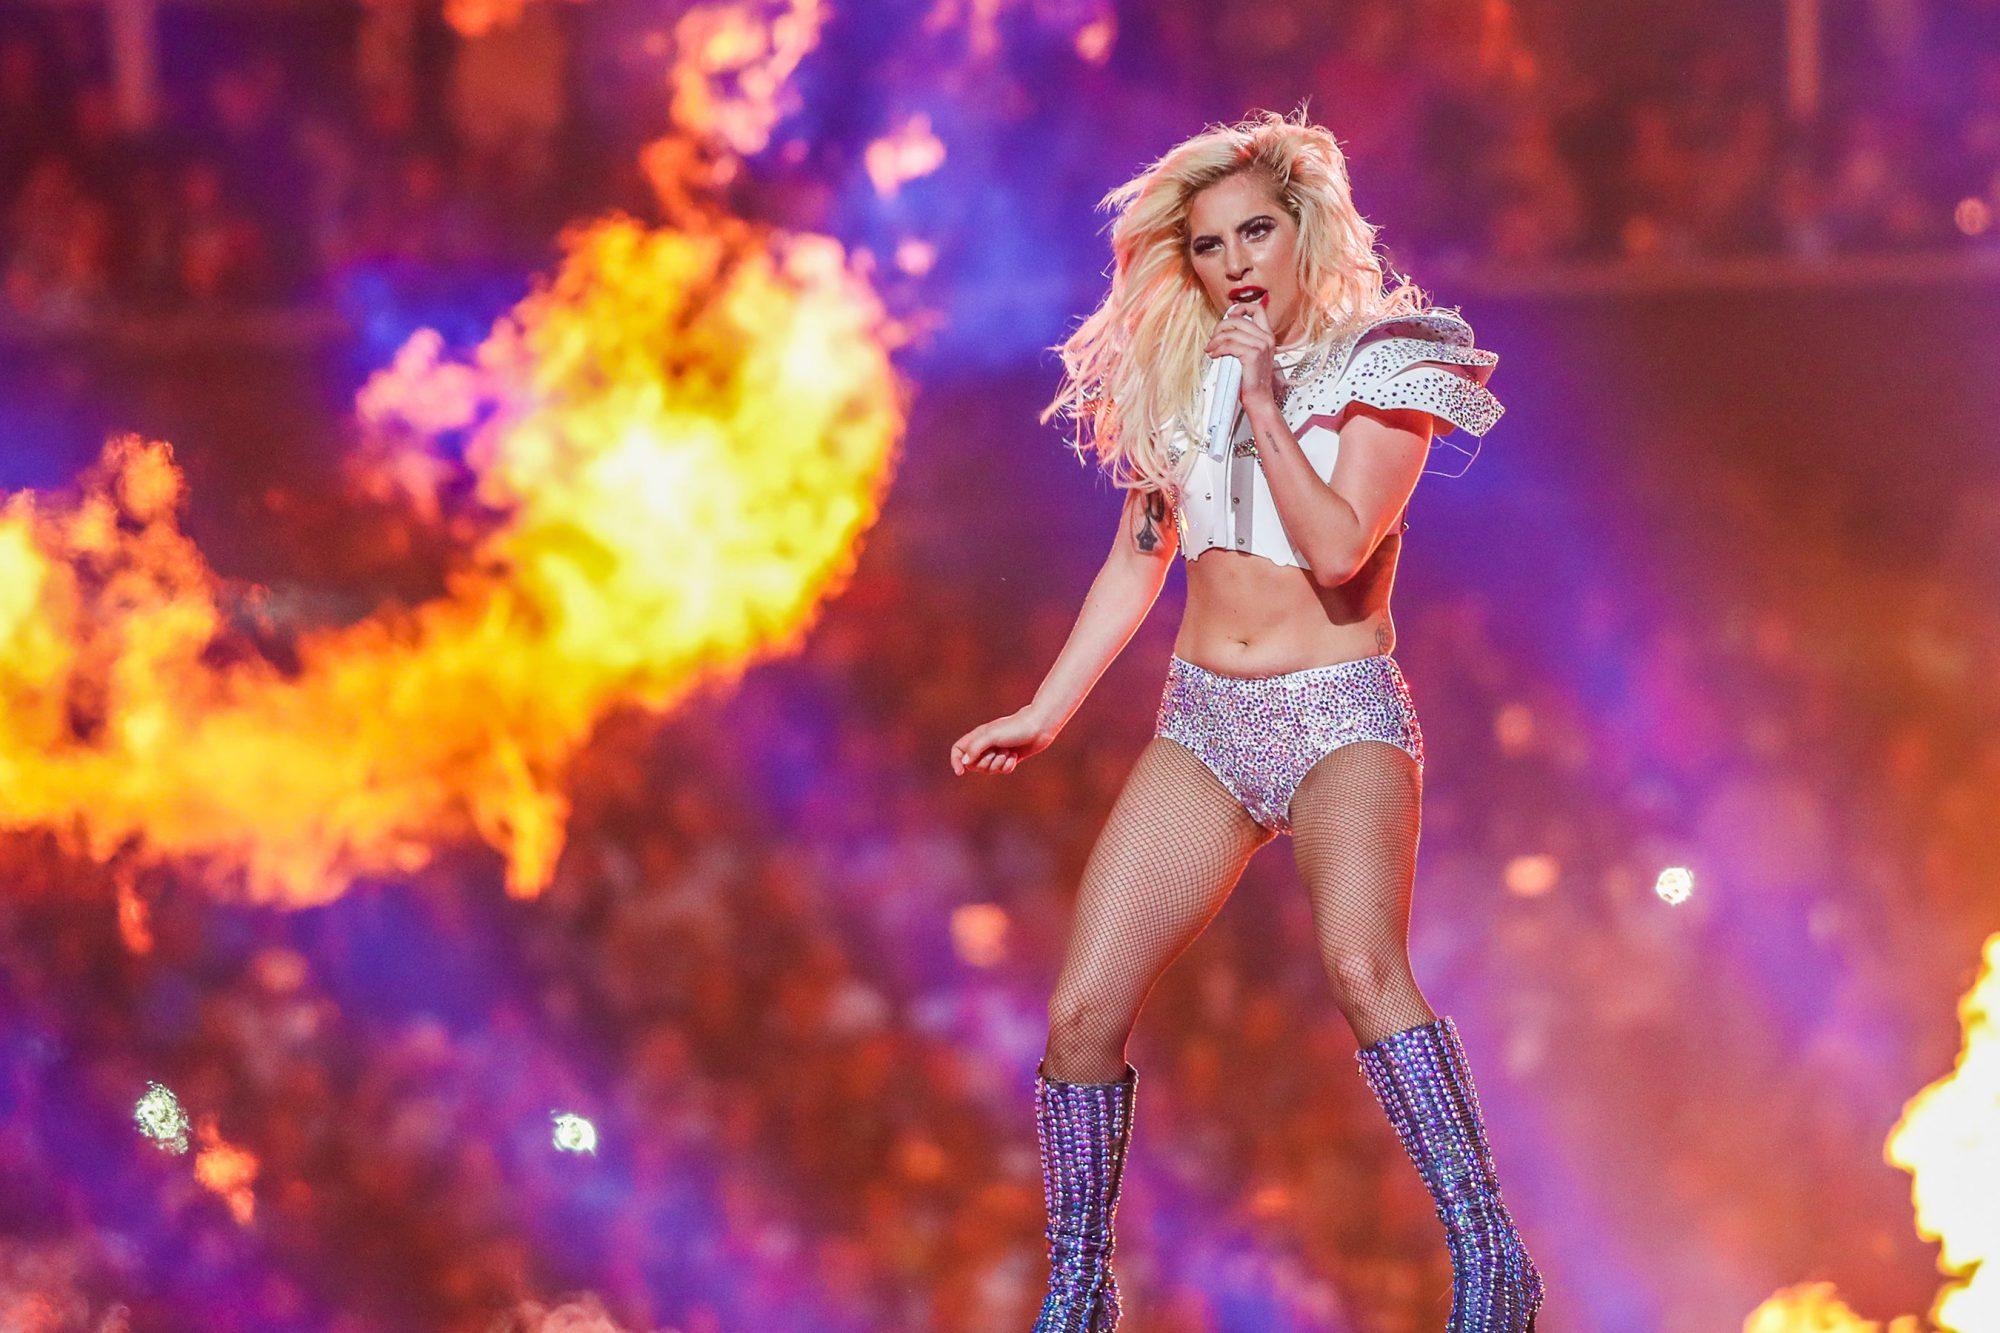 TX: Super Bowl LI - Lady Gaga Pepsi Zero Sugar Halftime Show